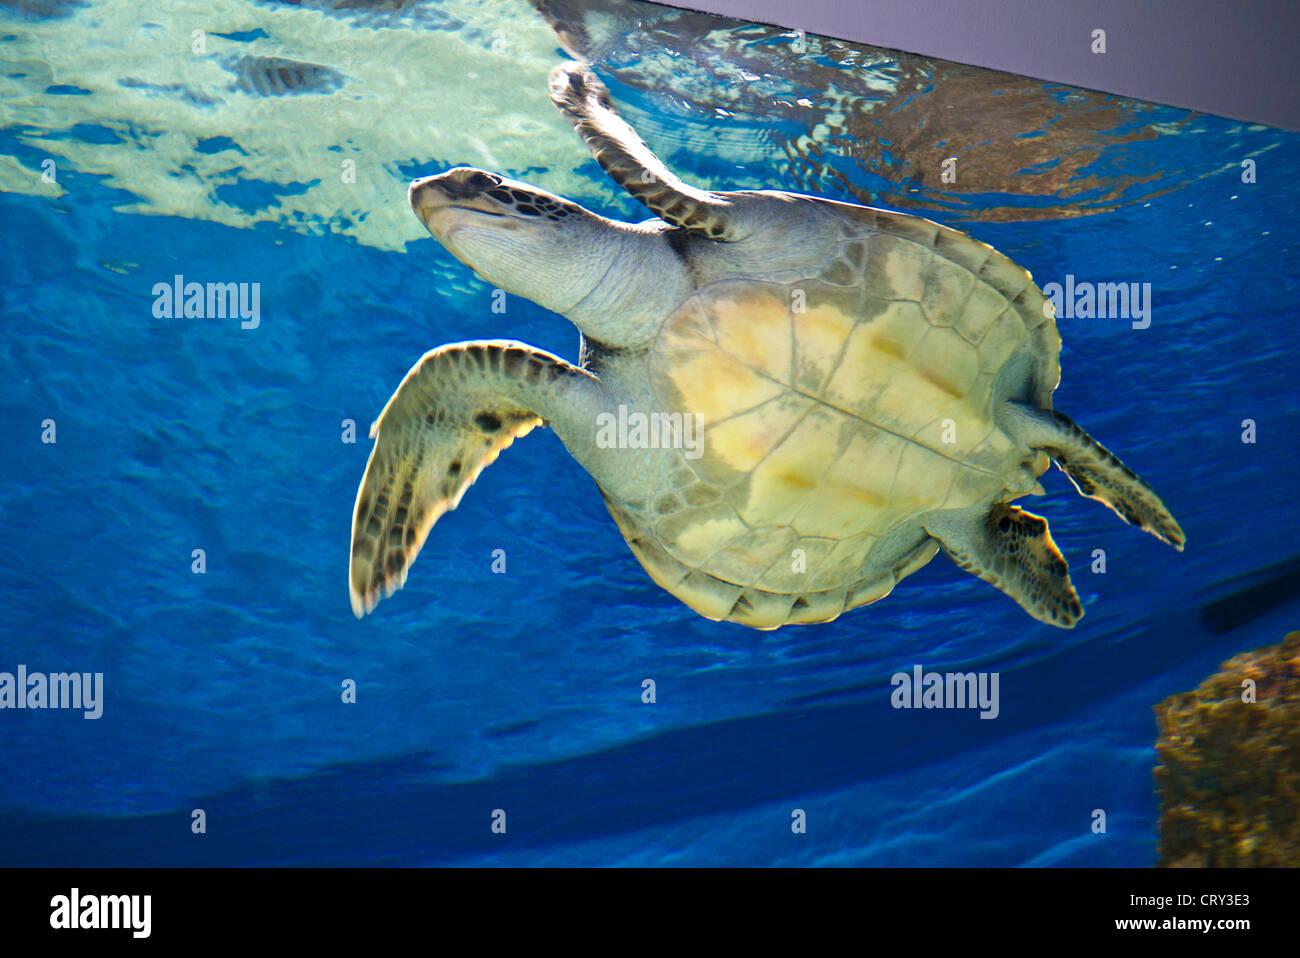 green sea turtle an endangered species in monterey bay aquarium